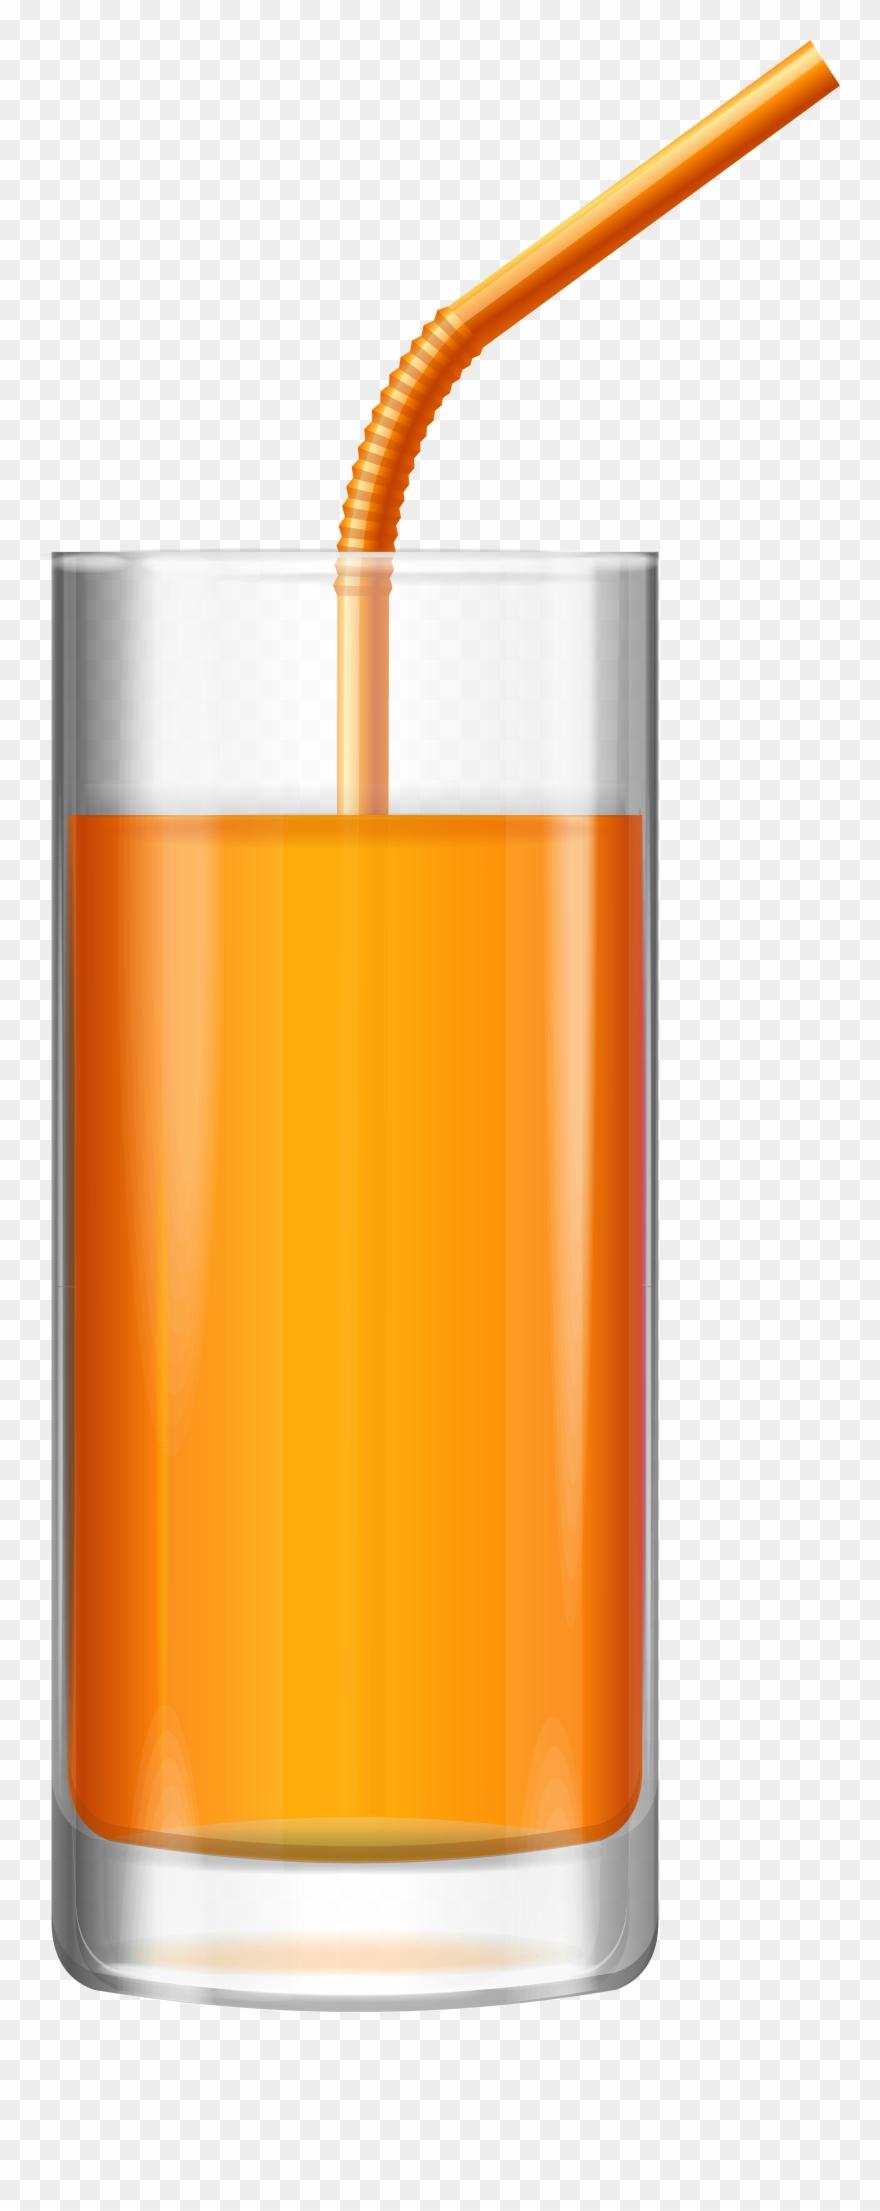 Orange Juice Clip Art Image Gallery Yopriceville High.